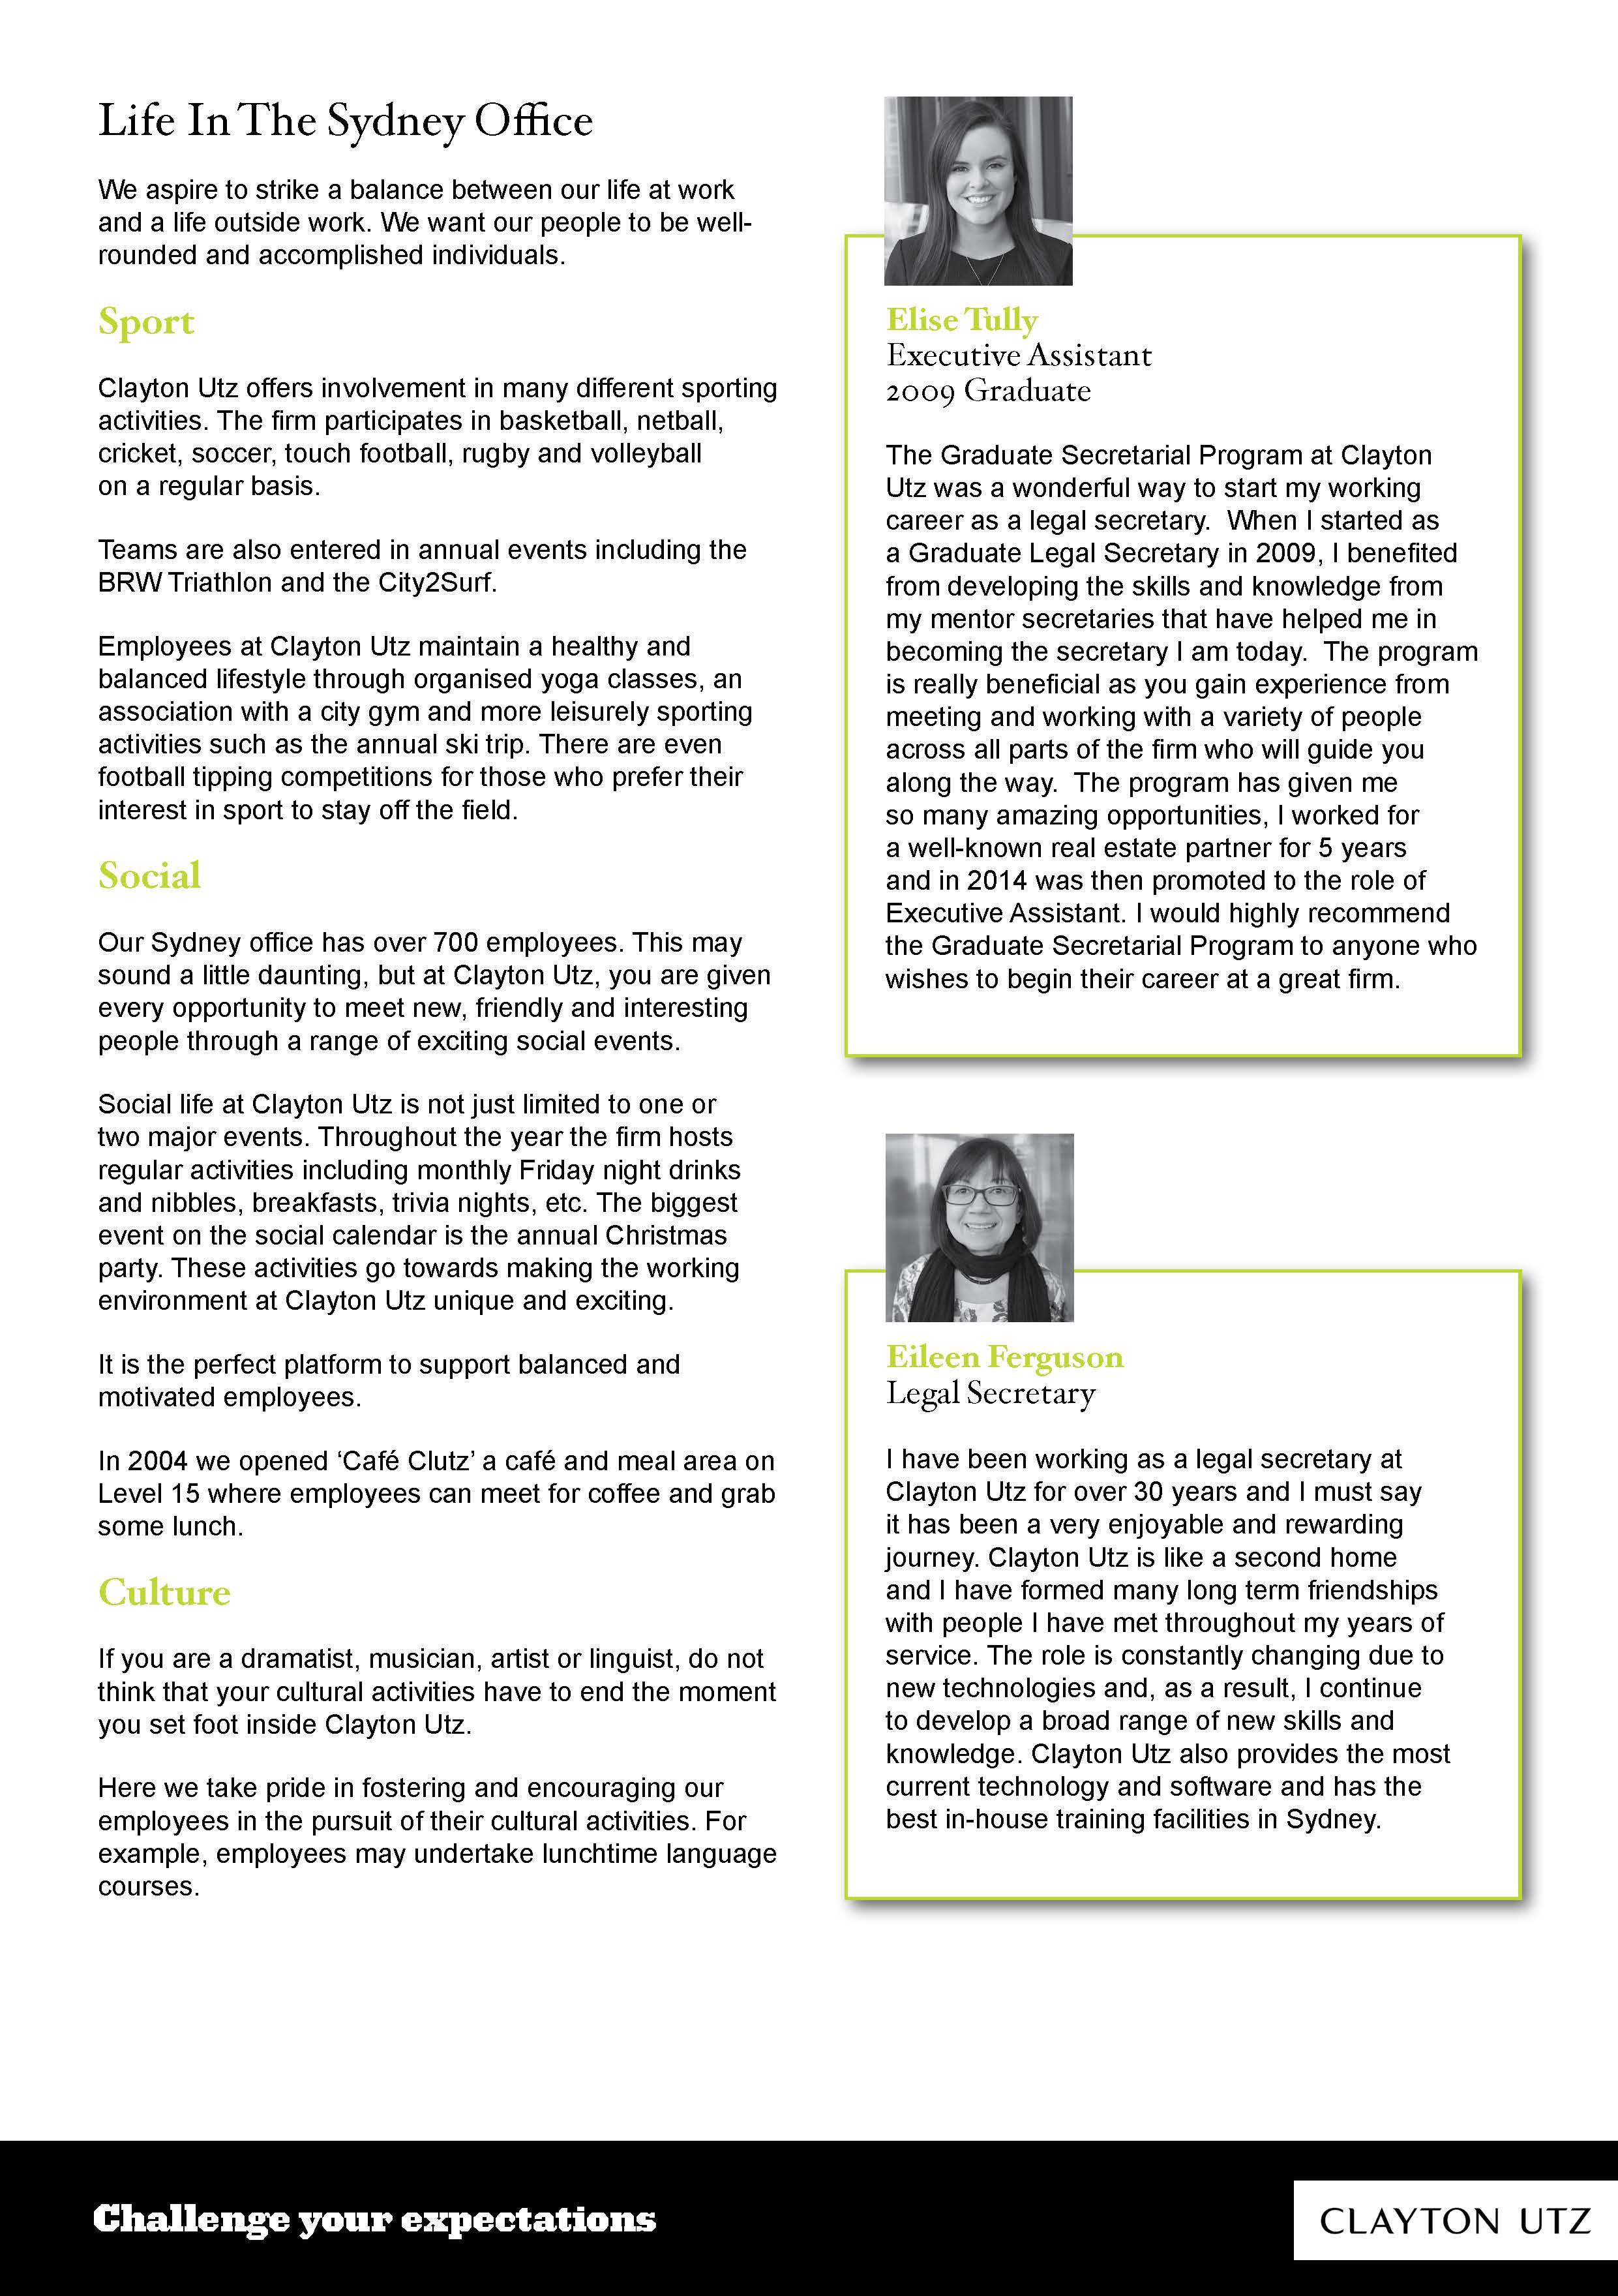 Clayton Utz Graduate_Secretarial_Program_Sydney_2019_Page_4.jpg